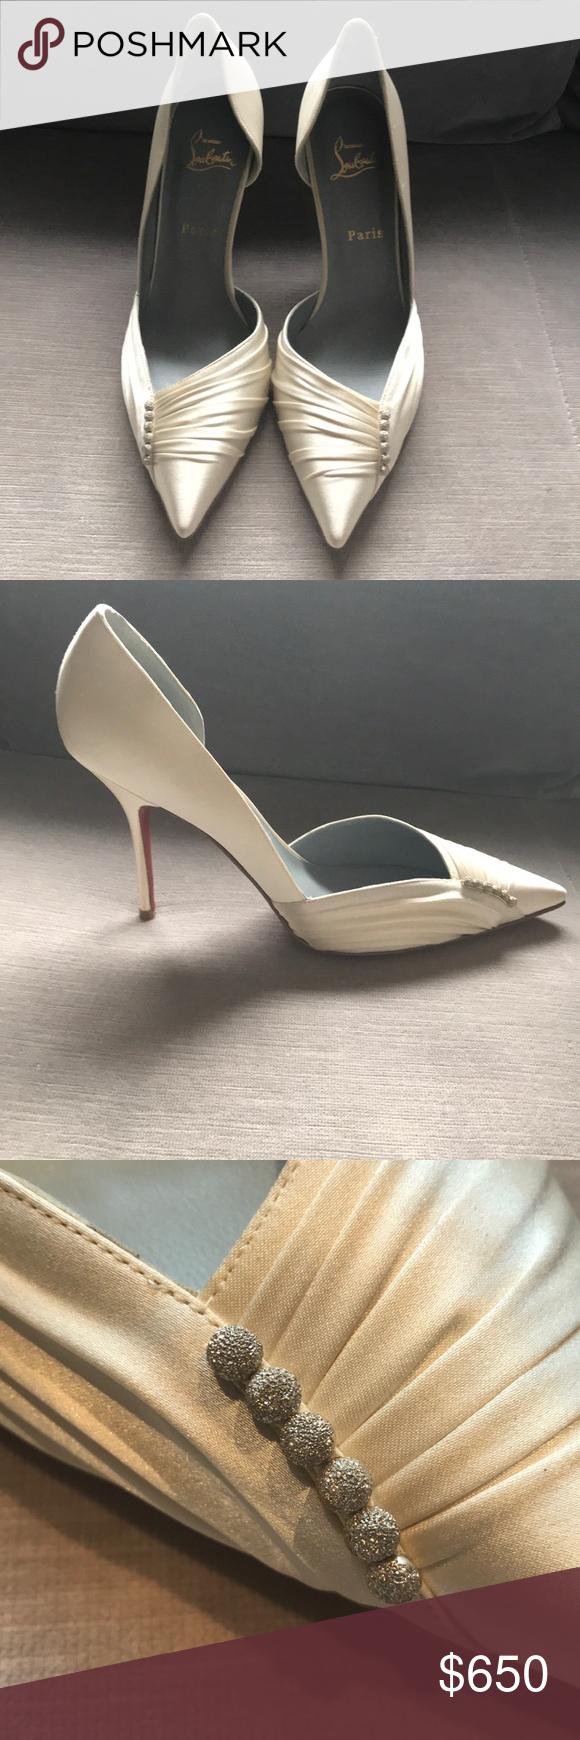 aea869ee847 Christian Louboutin wedding heels - size 41 New without box, never ...